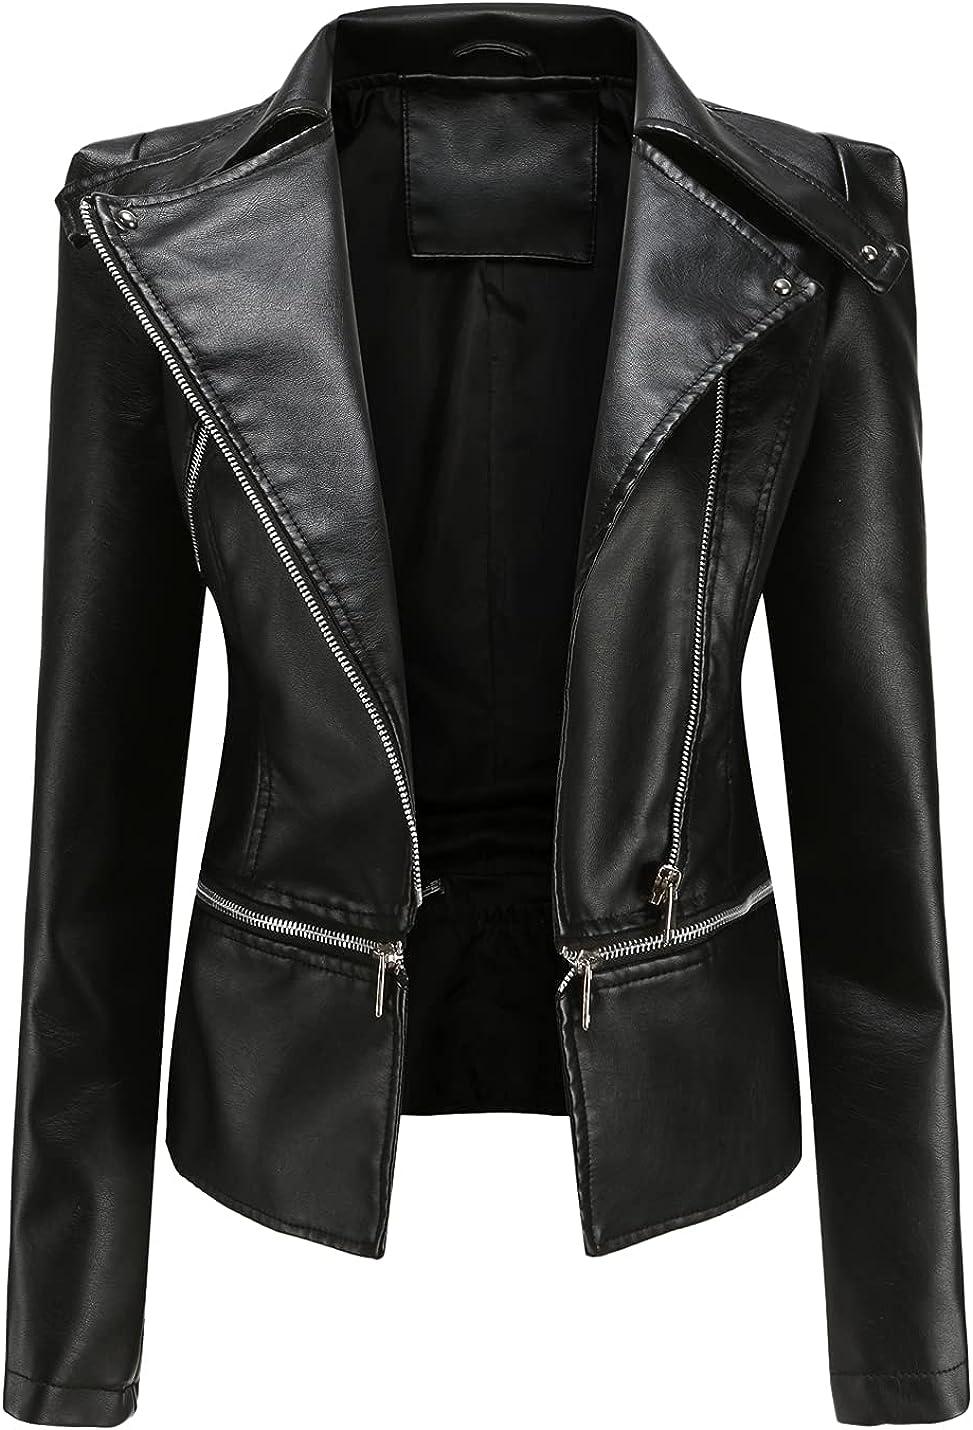 Peaceglad Womens Punk Gothic Crop Removable Faux Leather Moto Biker Jackets Long Sleeve Zip Up Lapel Coats